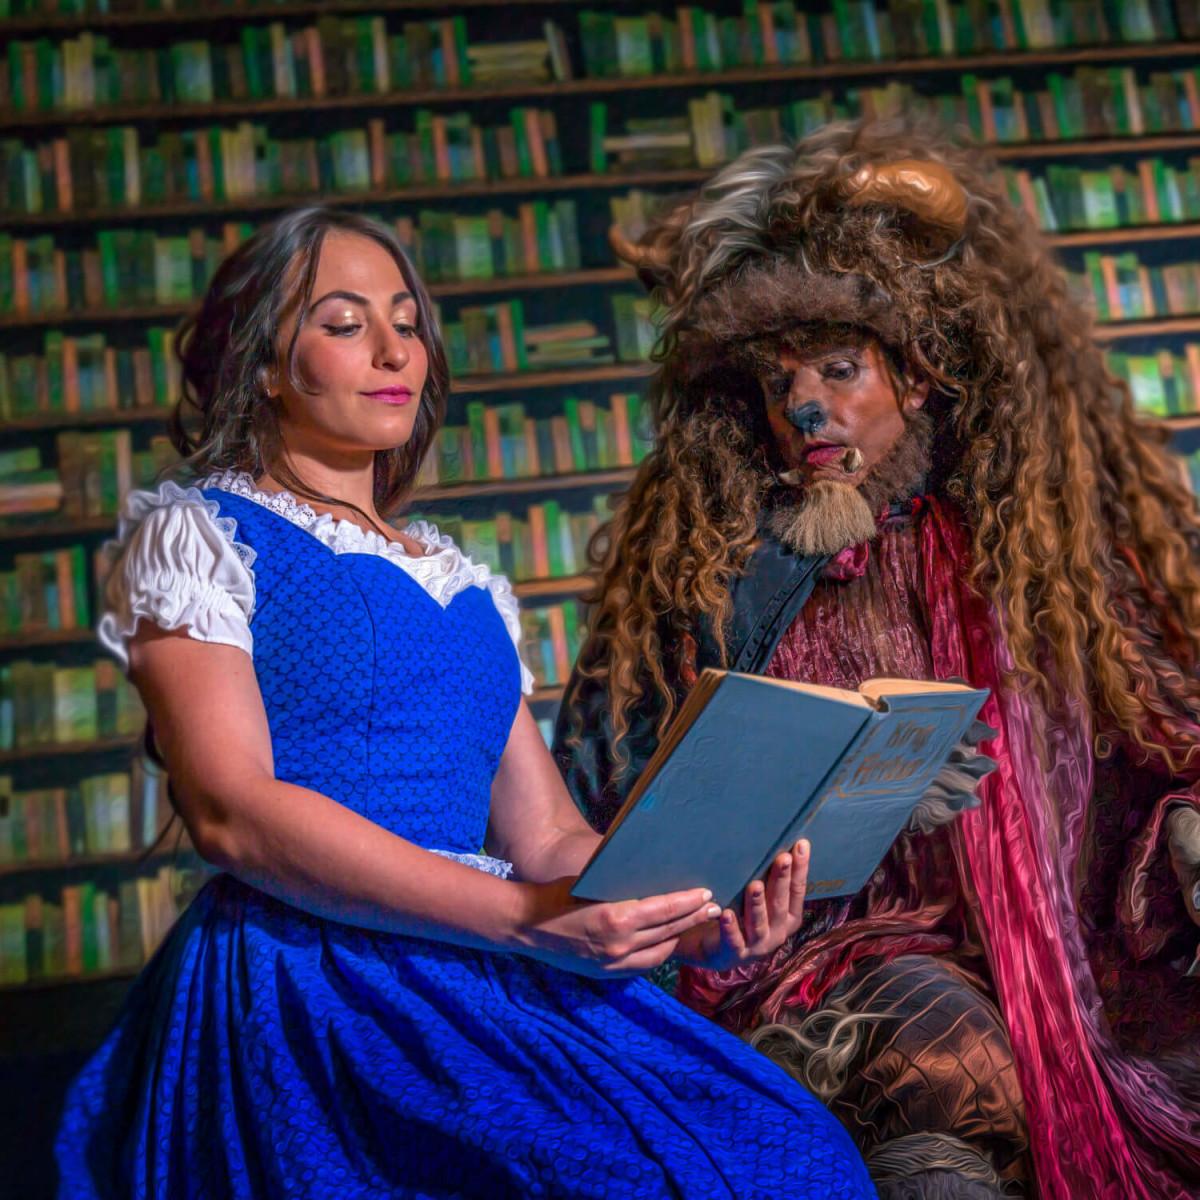 The Playhouse San Antonio presents Disney's Beauty and the Beast